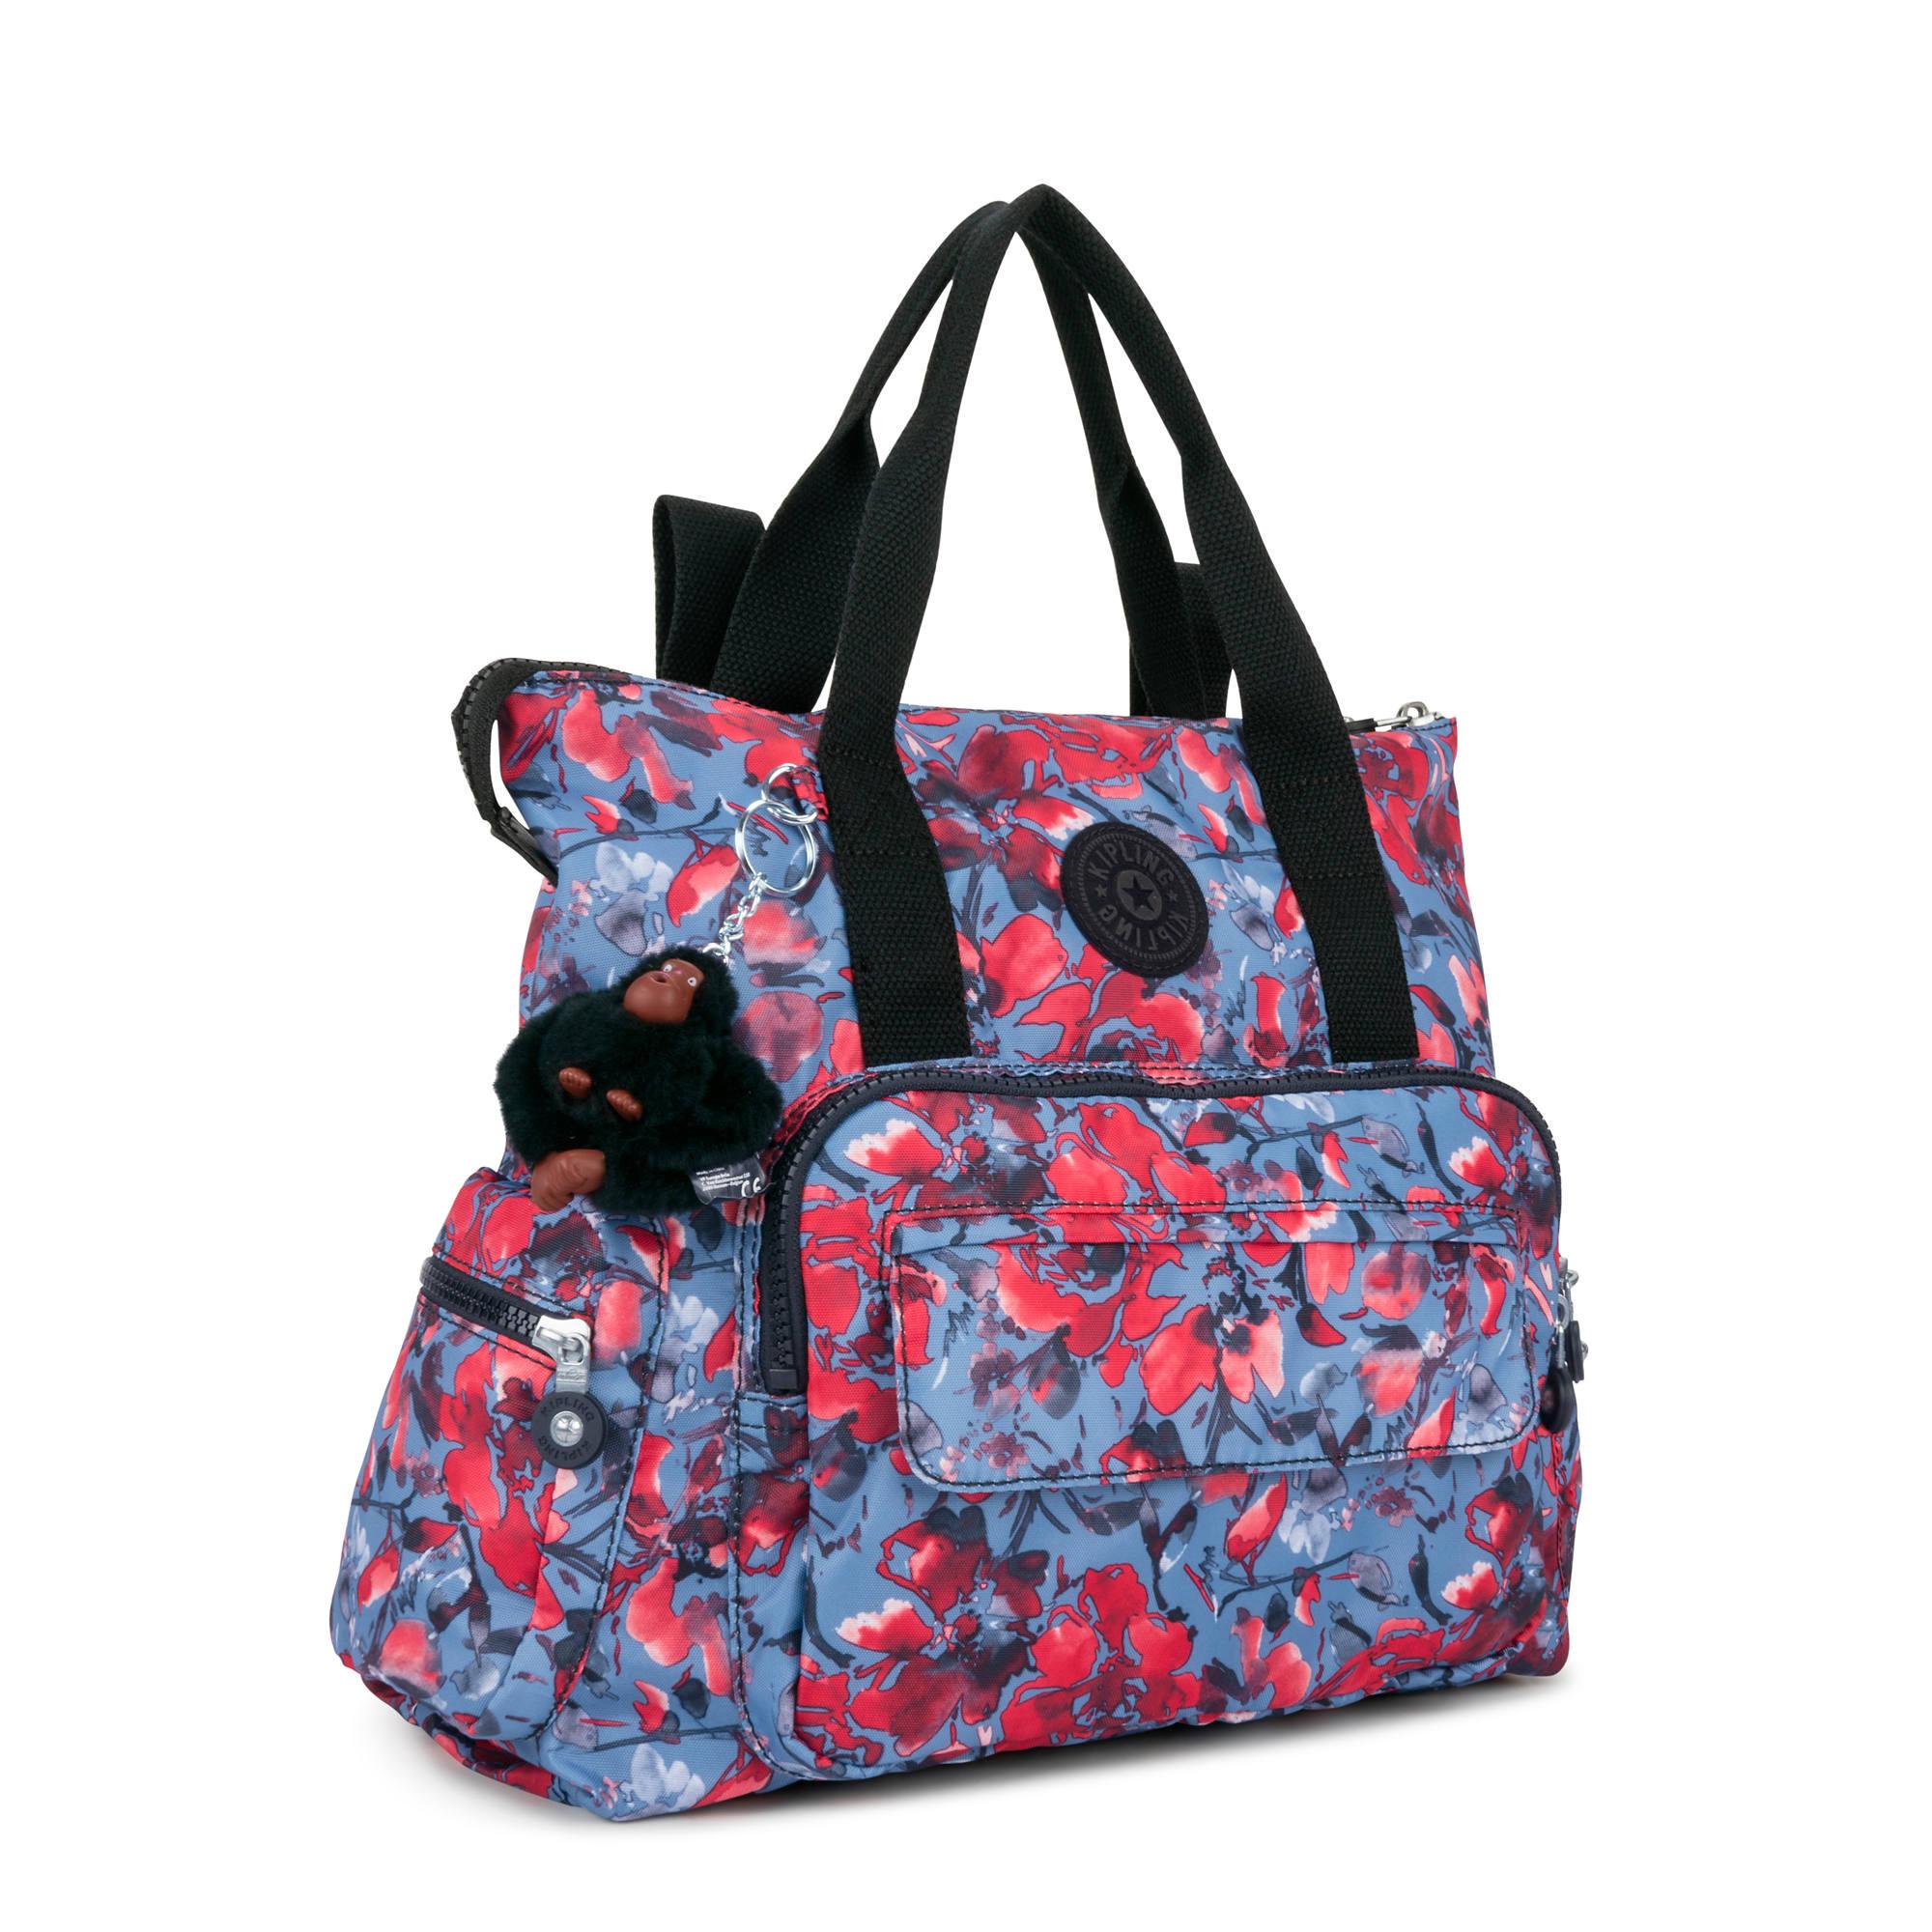 Kipling-Alvy-2-In-1-Convertible-Tote-Bag-Backpack miniatura 23